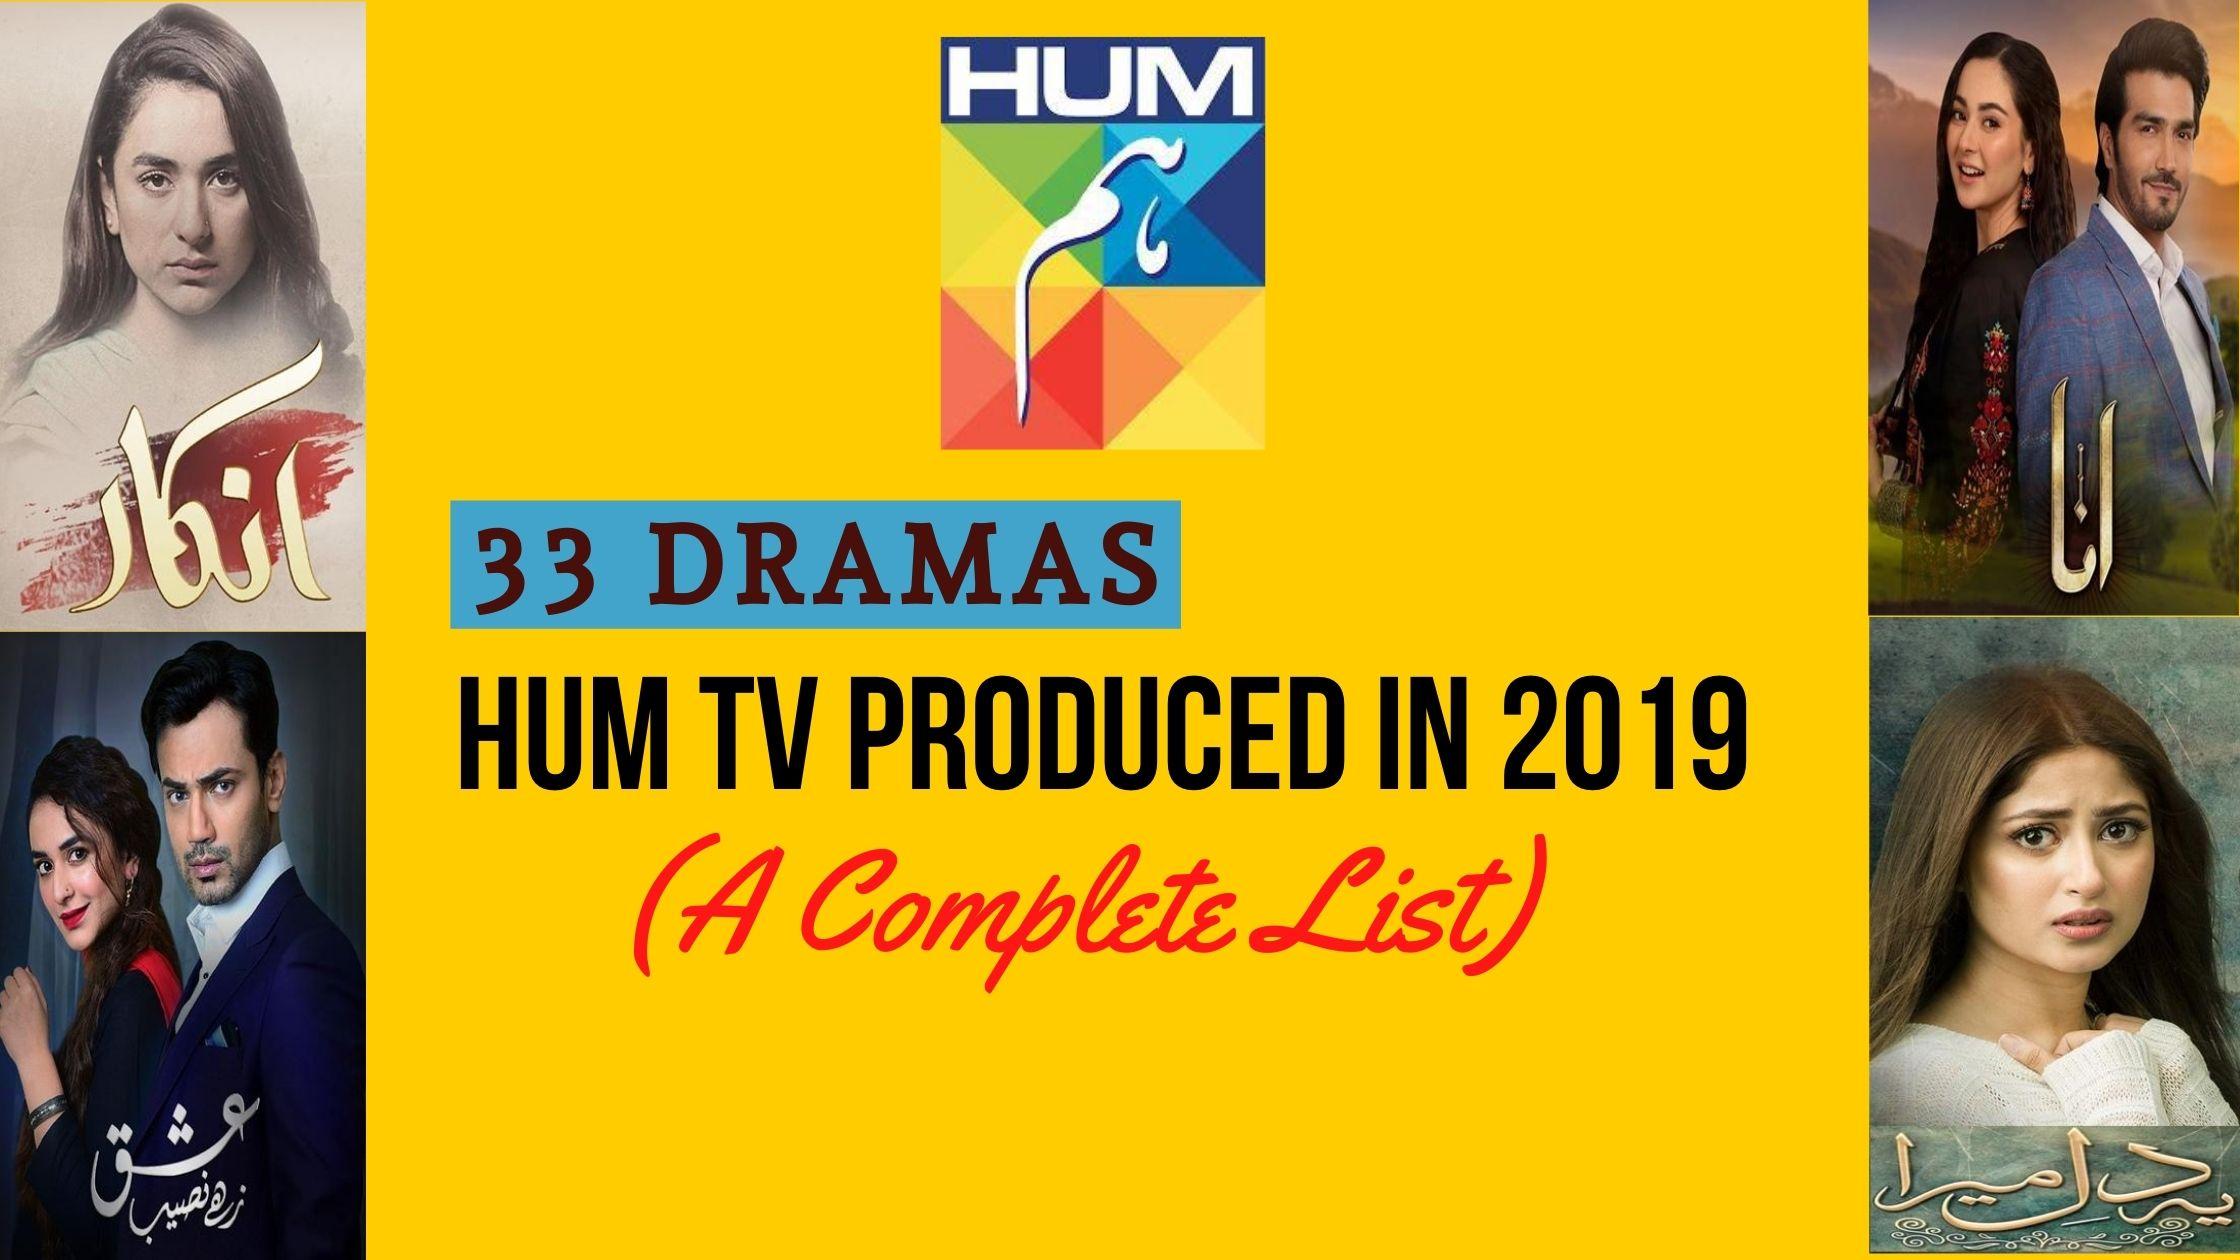 HUM TV Dramas List 2019